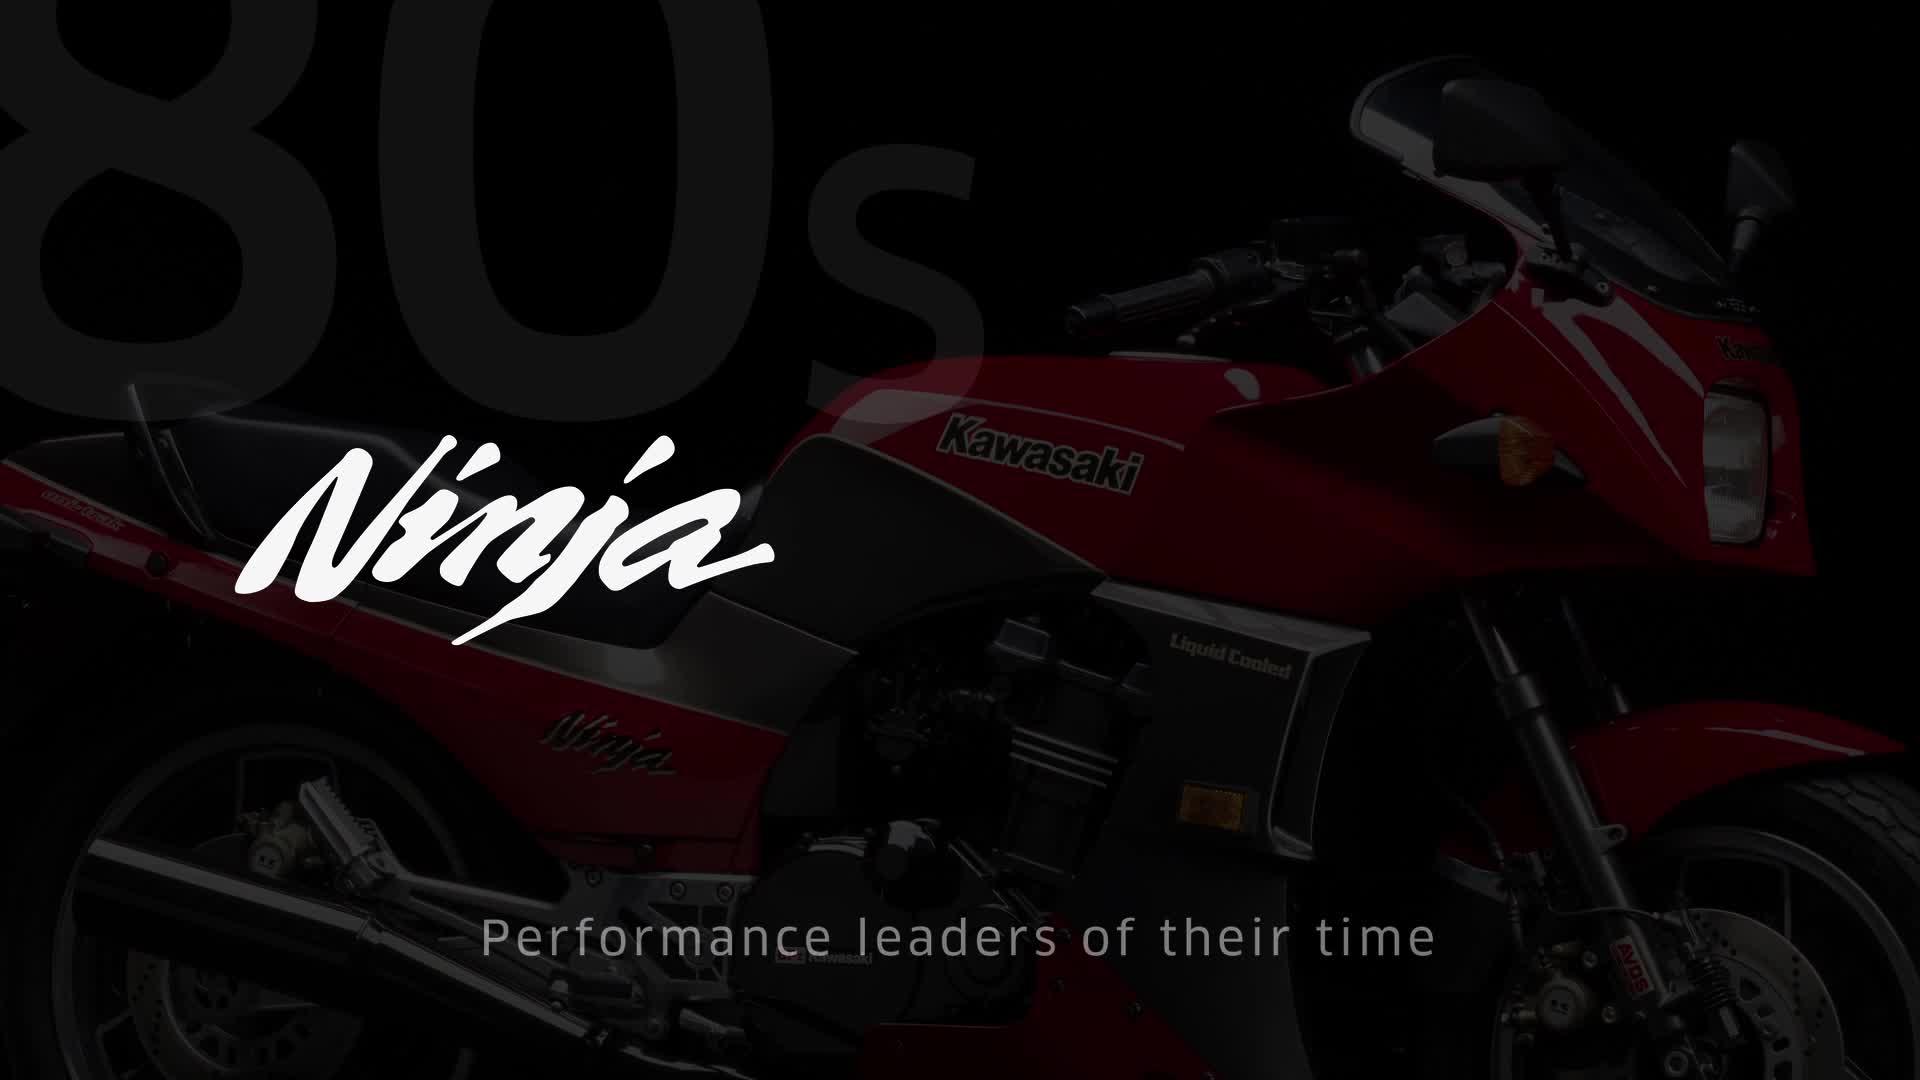 Kawasaki Performance Leaders